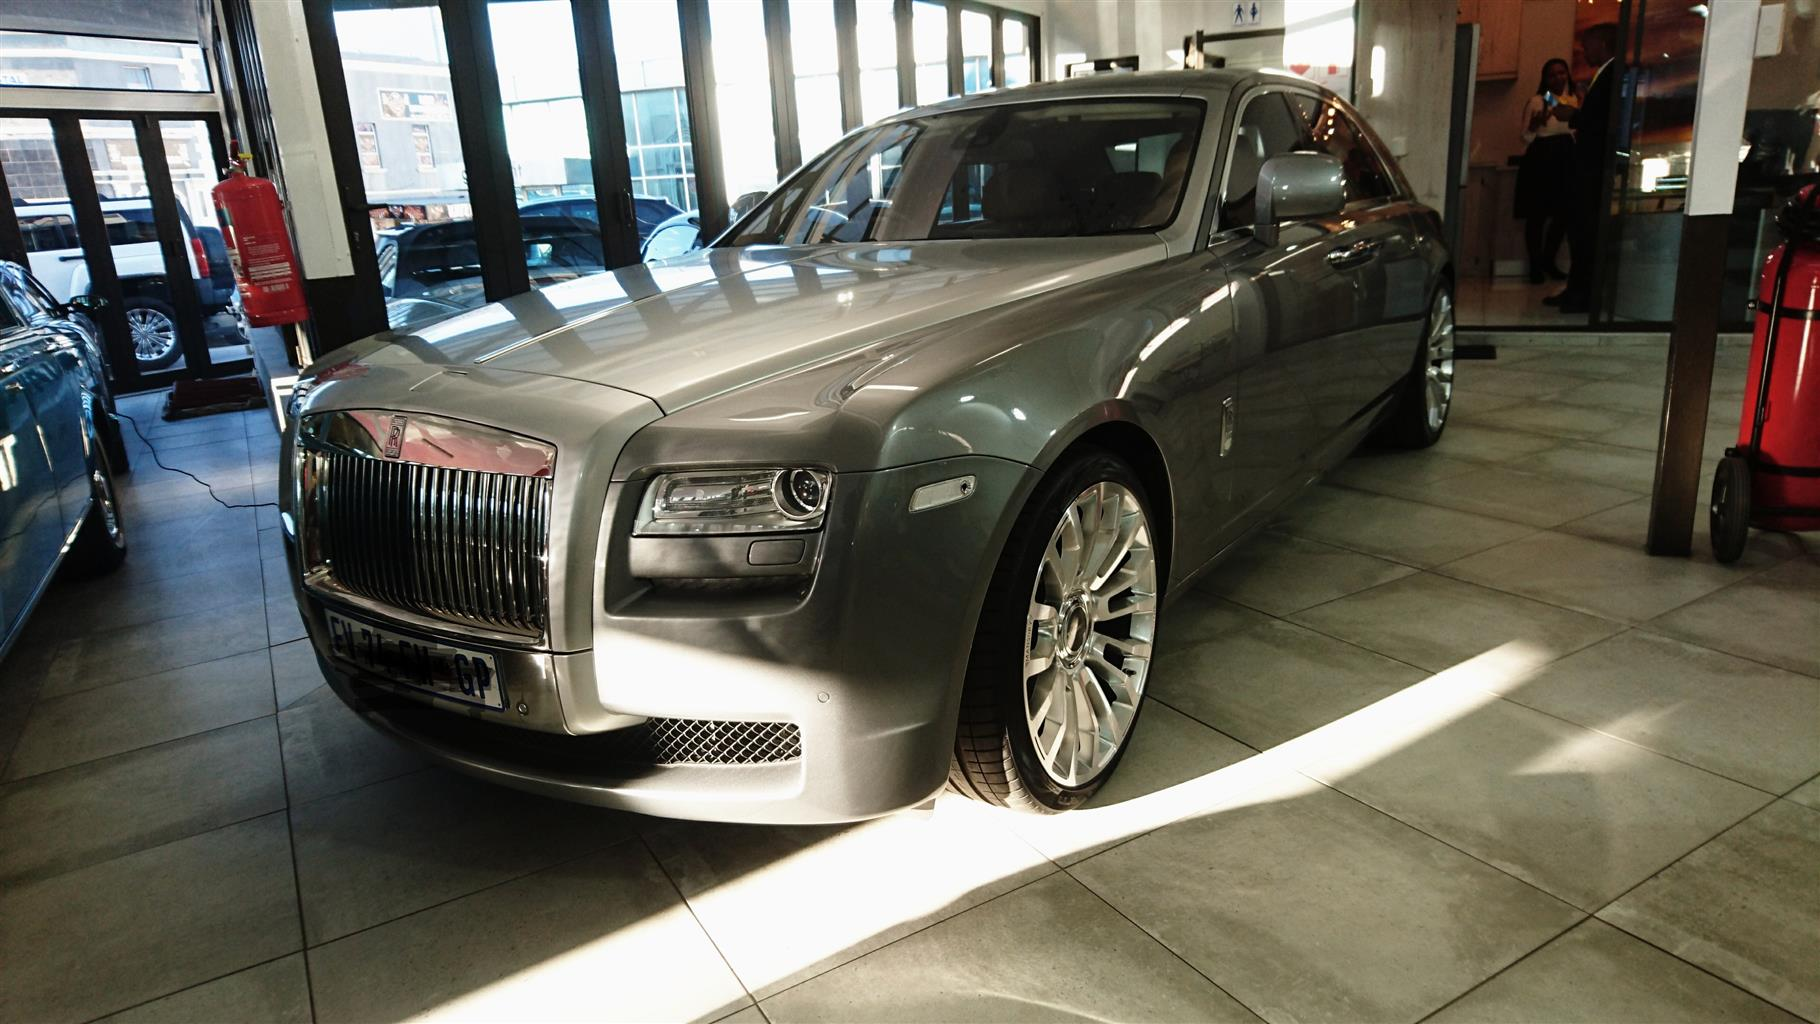 2012 Rolls Royce Ghost Extended Wheelbase Junk Mail